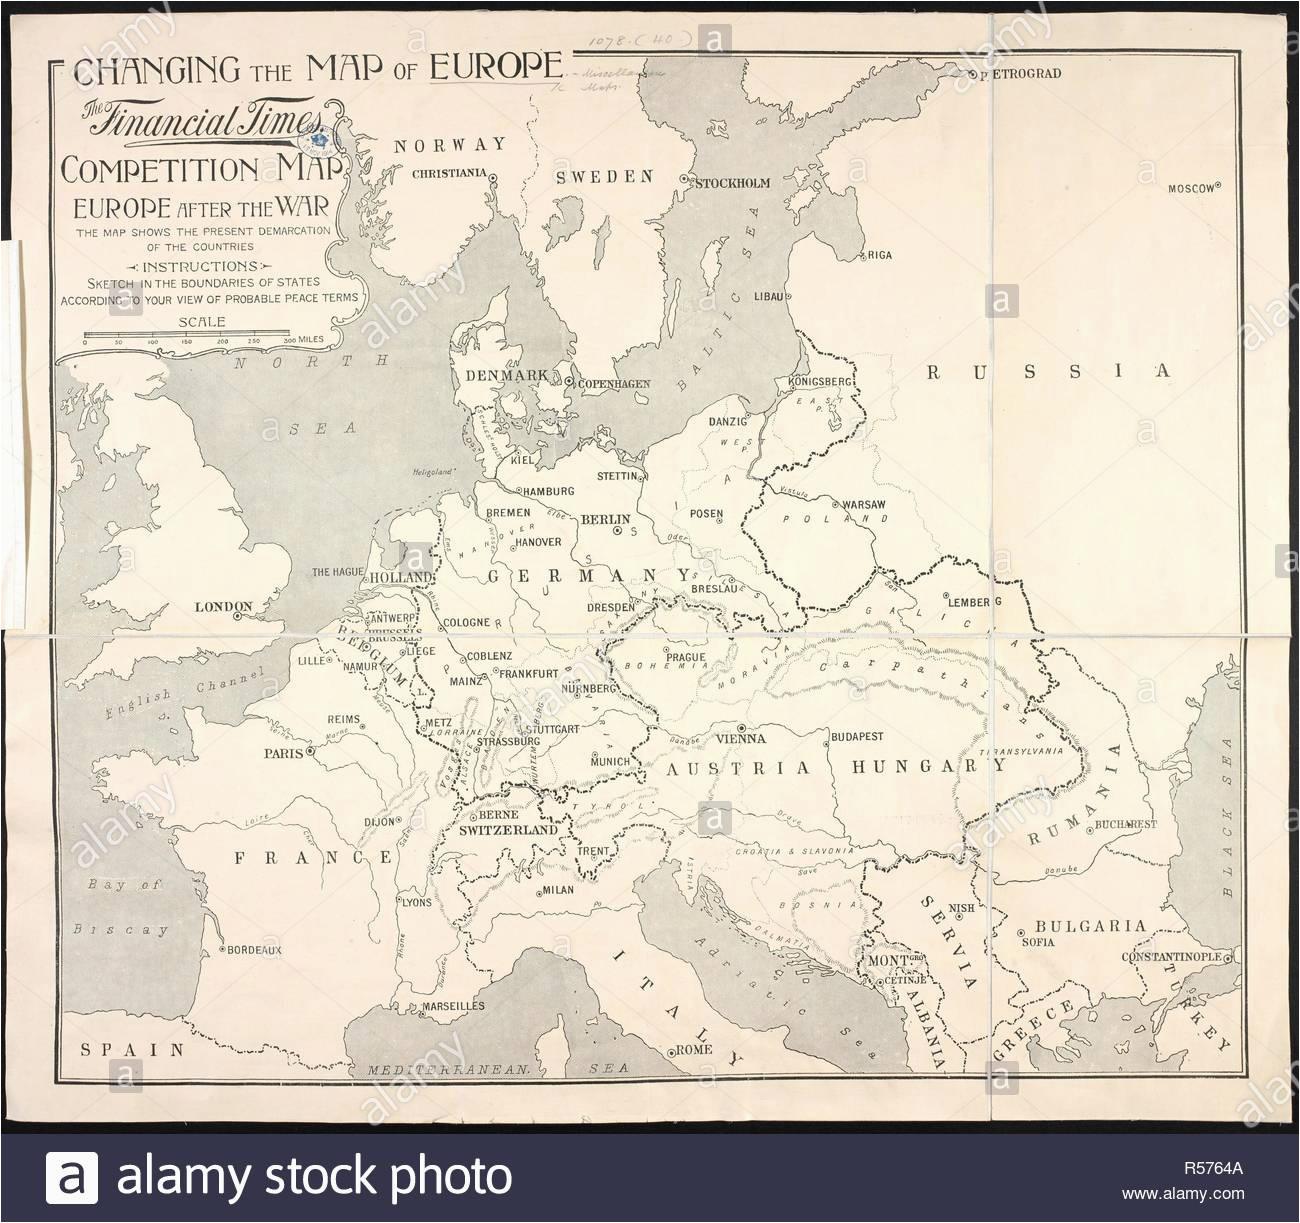 map europe world war i stock photos map europe world war i